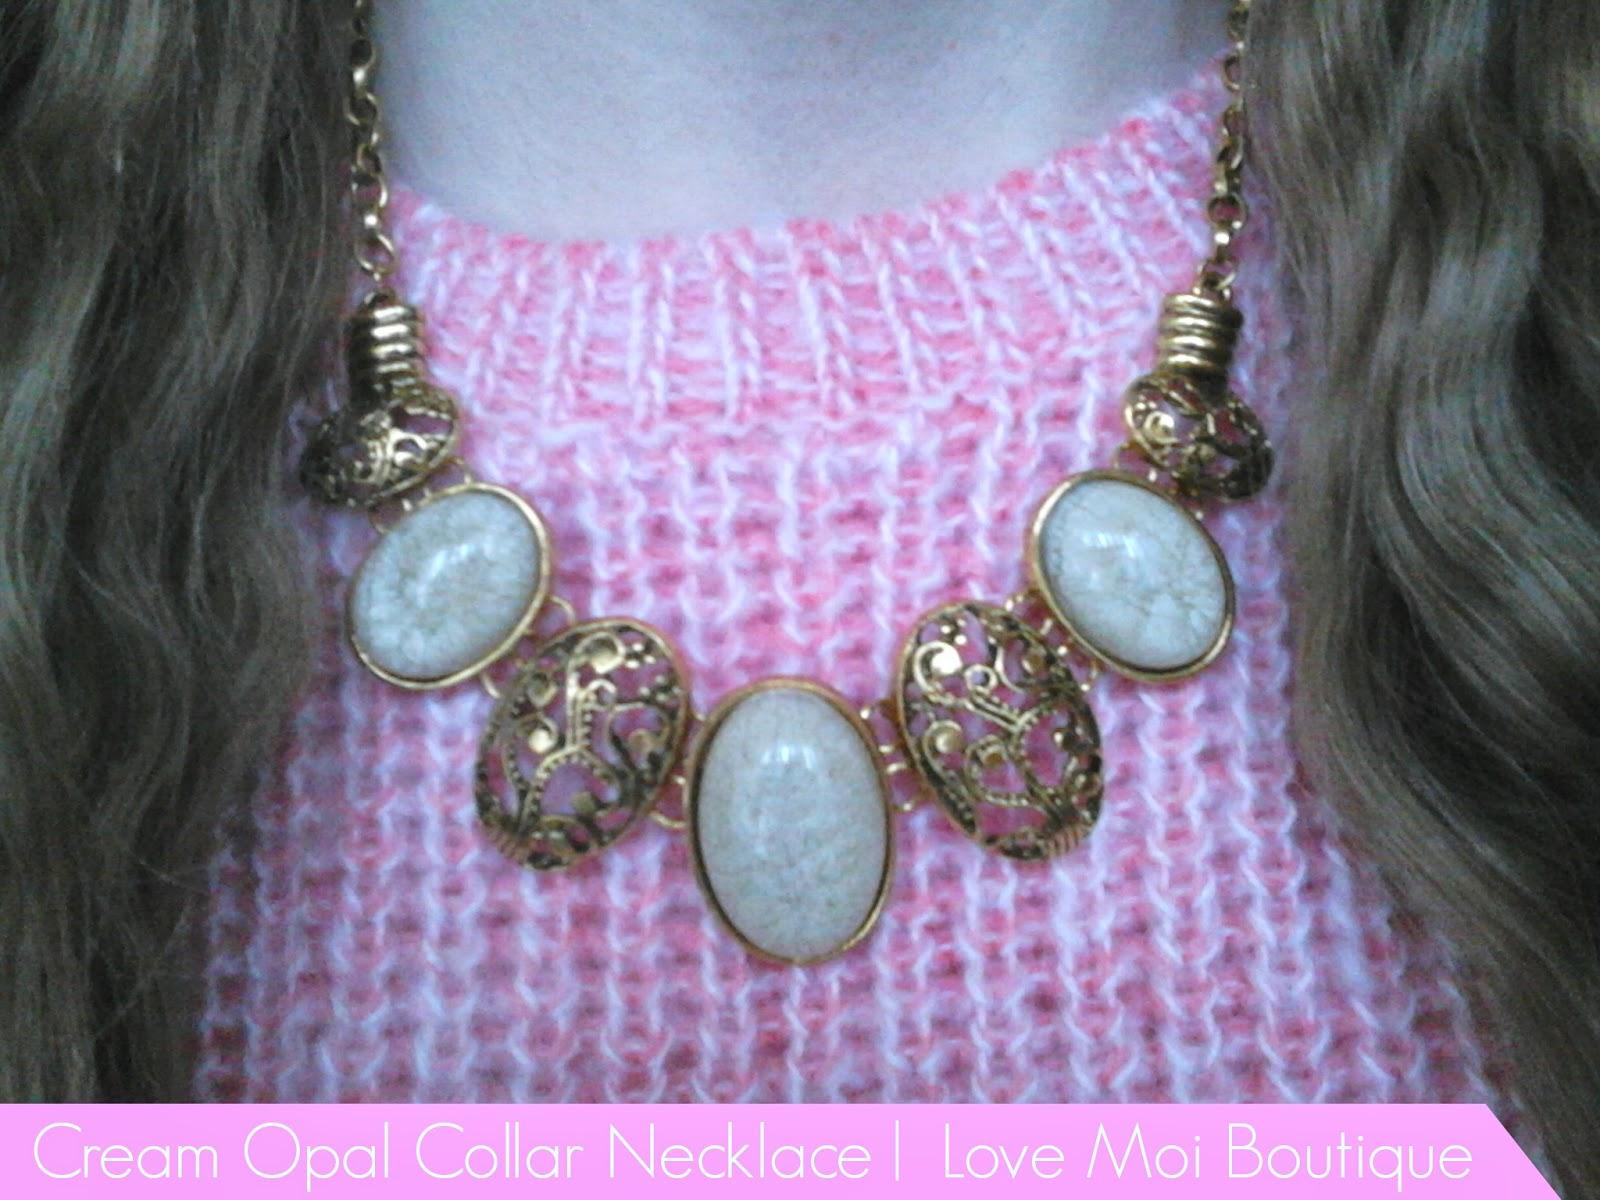 Cream Opal Collar Necklace